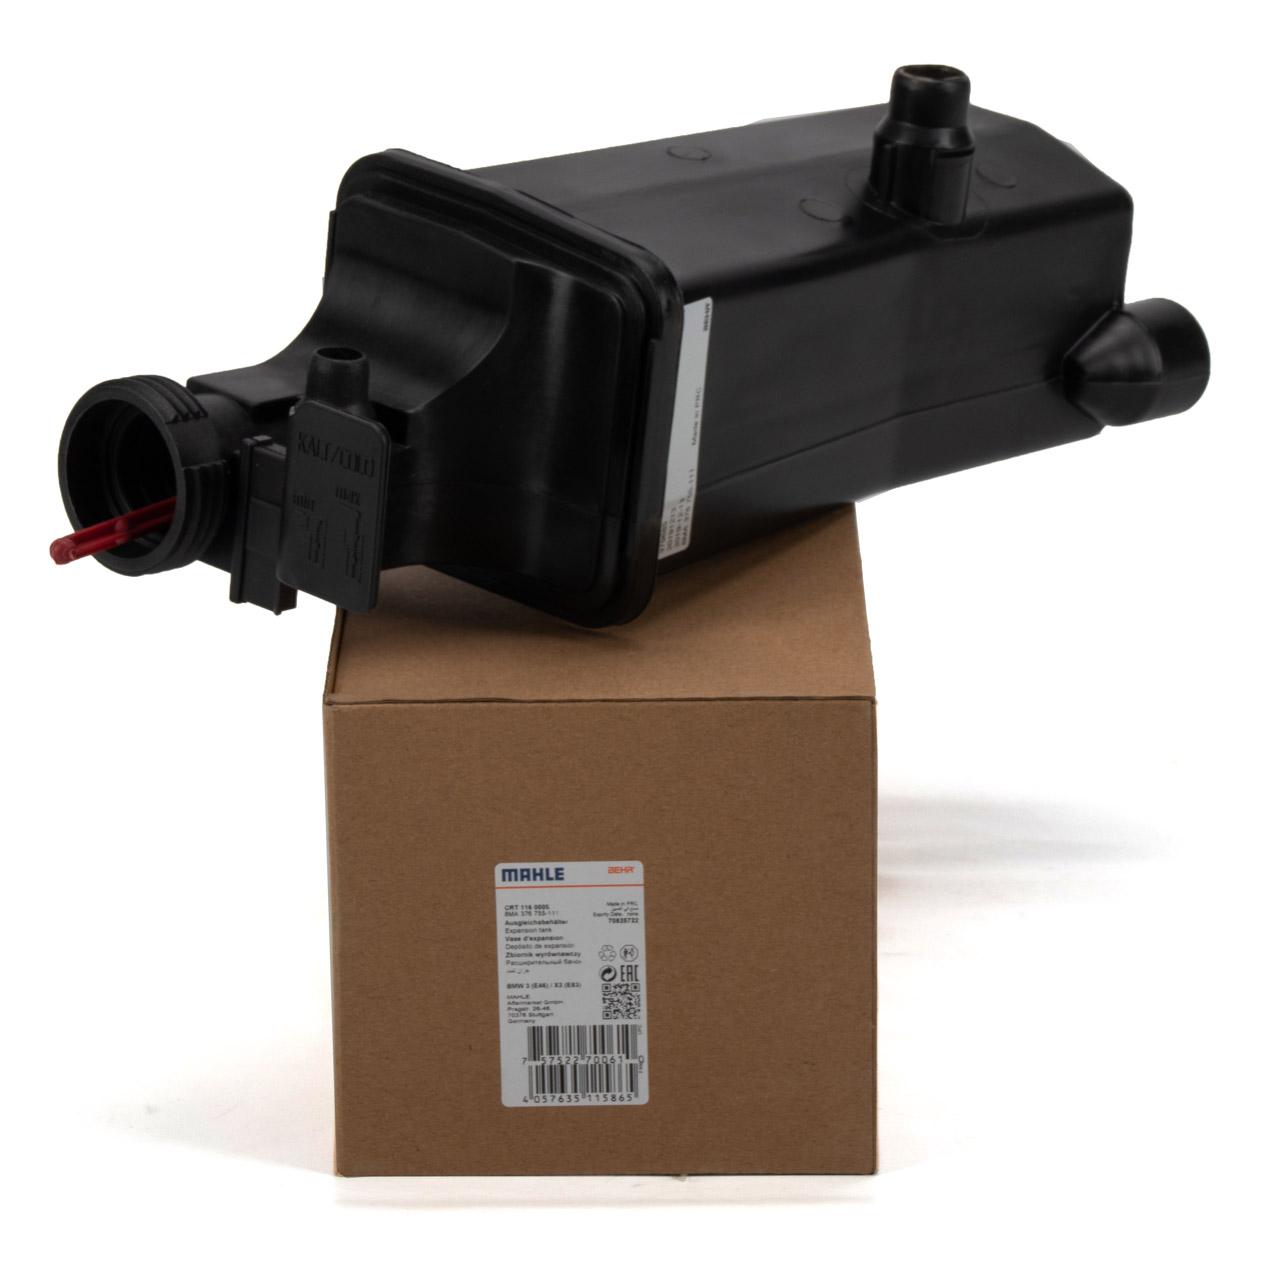 MAHLE Ausgleichsbehälter Kühlwasserbehälter BMW 3er E46 316-330 X3 E38 X5 E53 17137573781